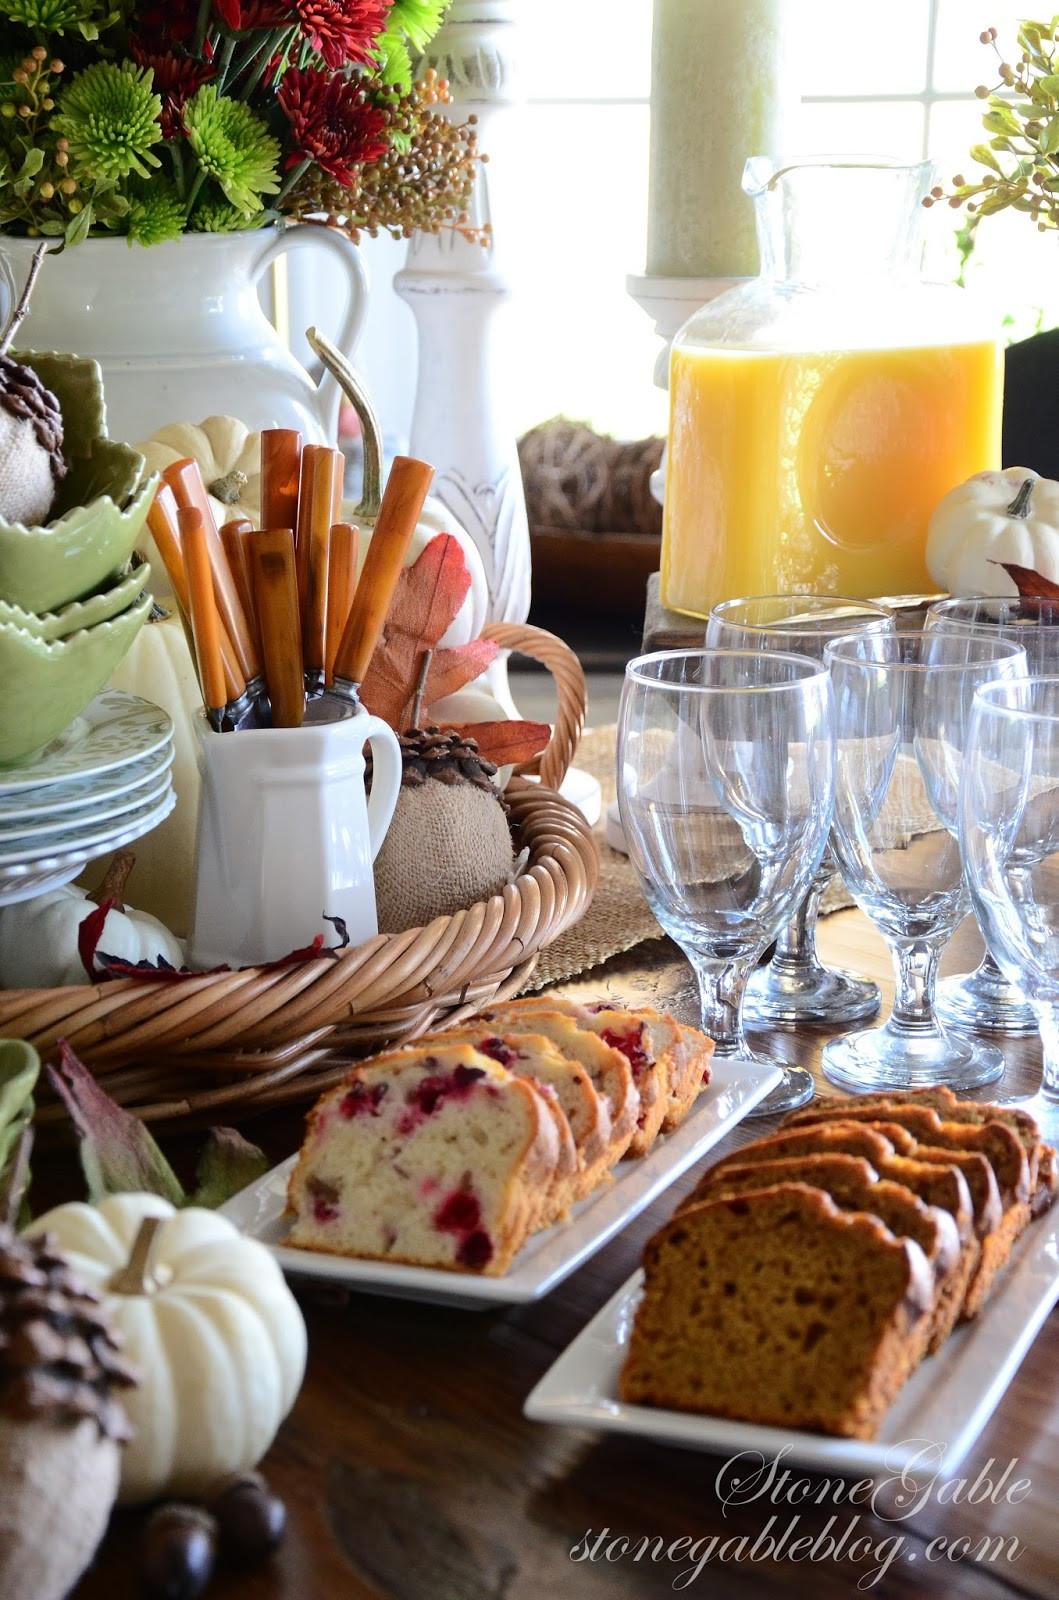 Breakfast On Thanksgiving Day  THANKSGIVING CONTINENTAL BREAKFAST VIGNETTE Interior